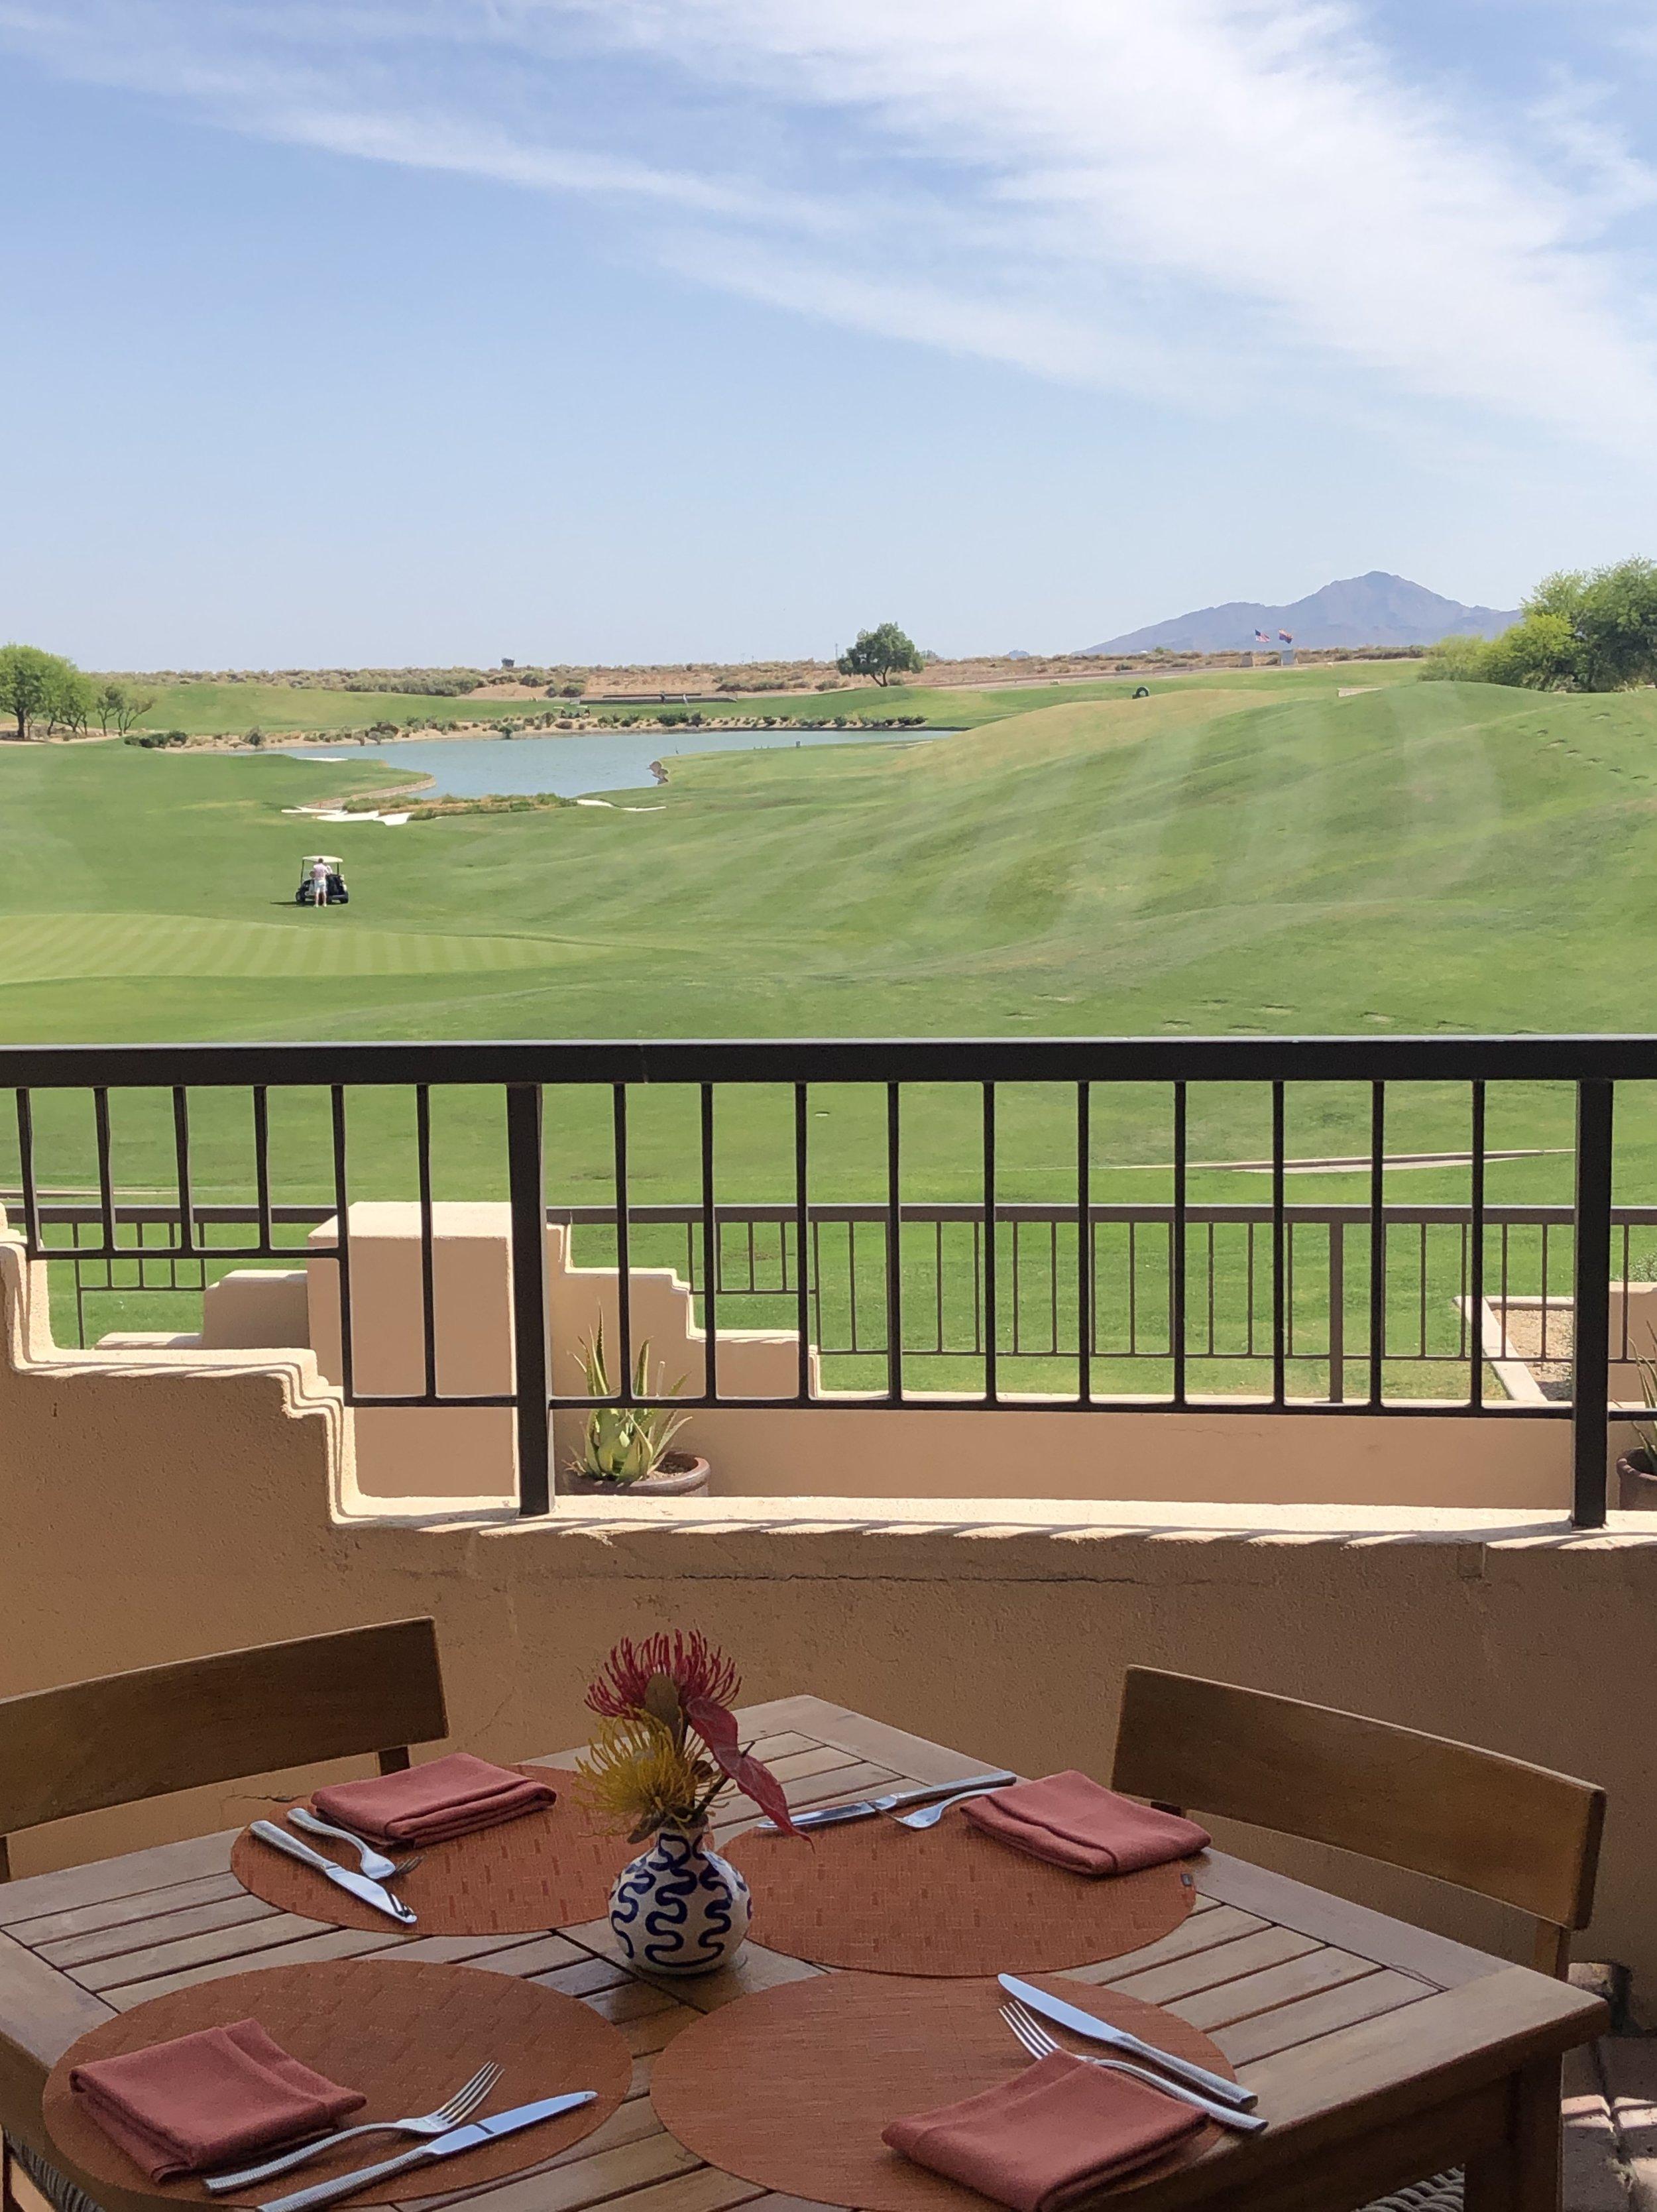 Wanderlust-travel-blog-TPC-Scottsdale-Arizona-golf